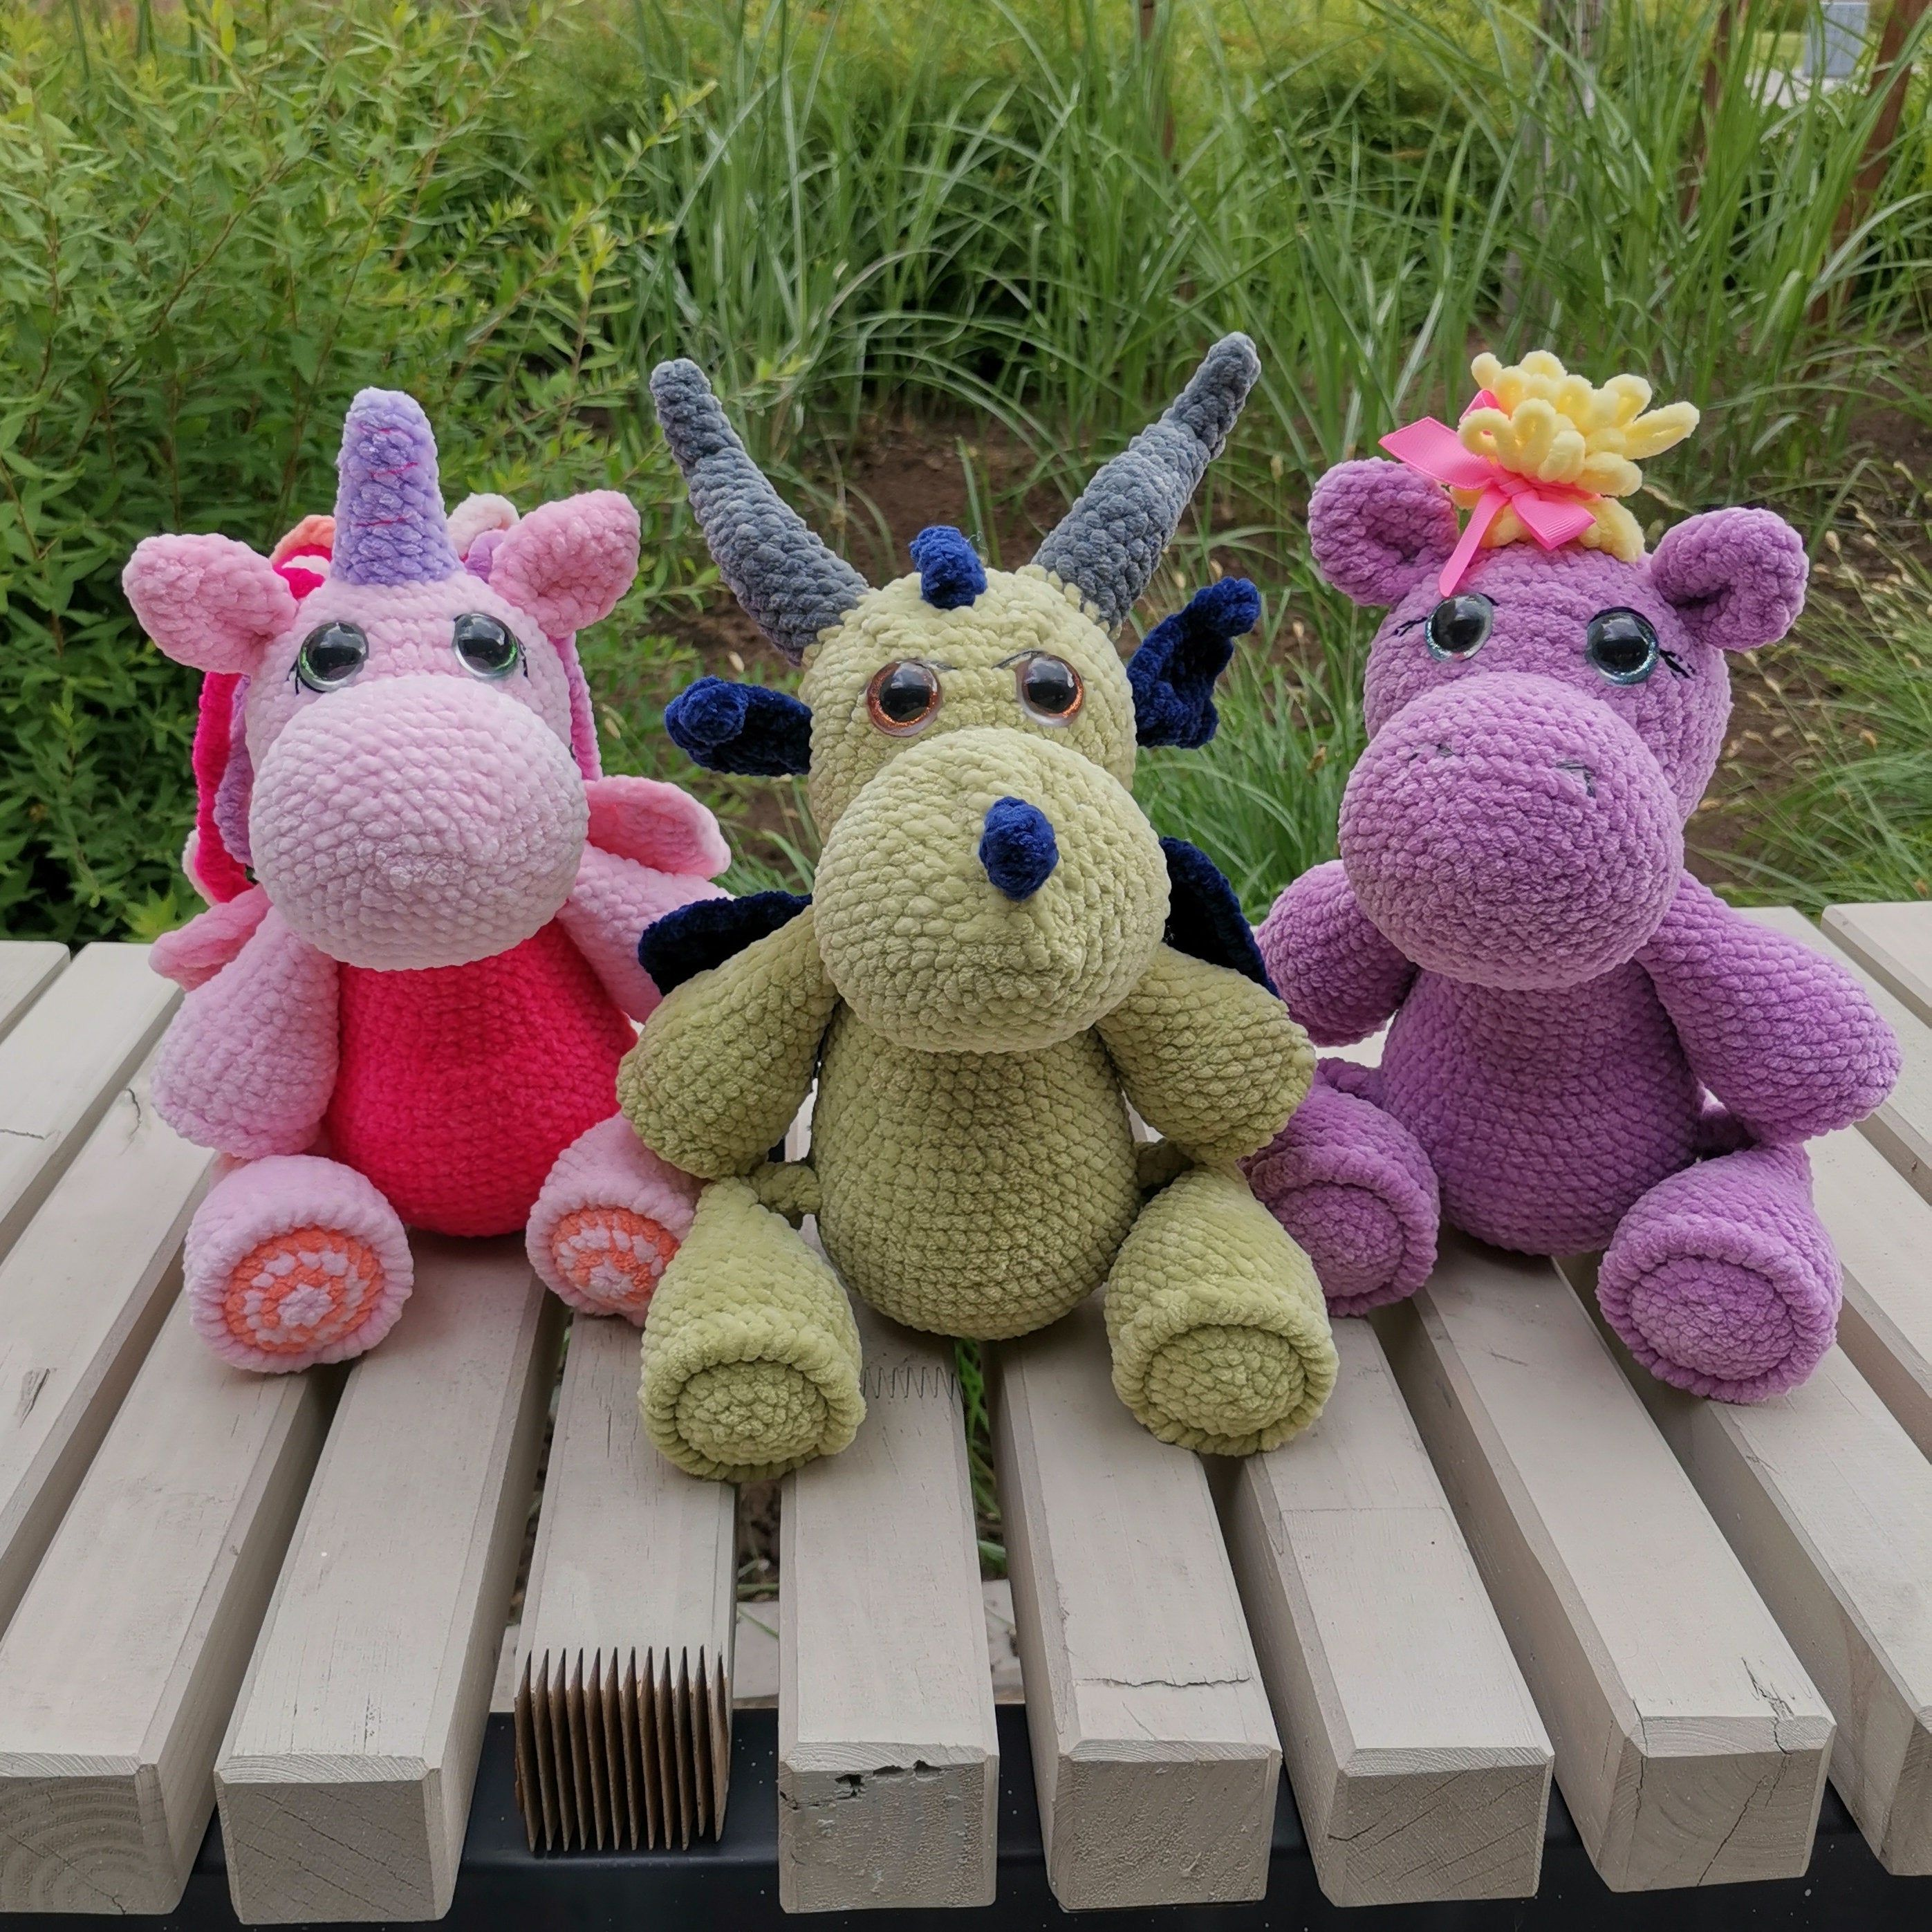 English Crochet Pattern series 3 in 1, Amigurumi t